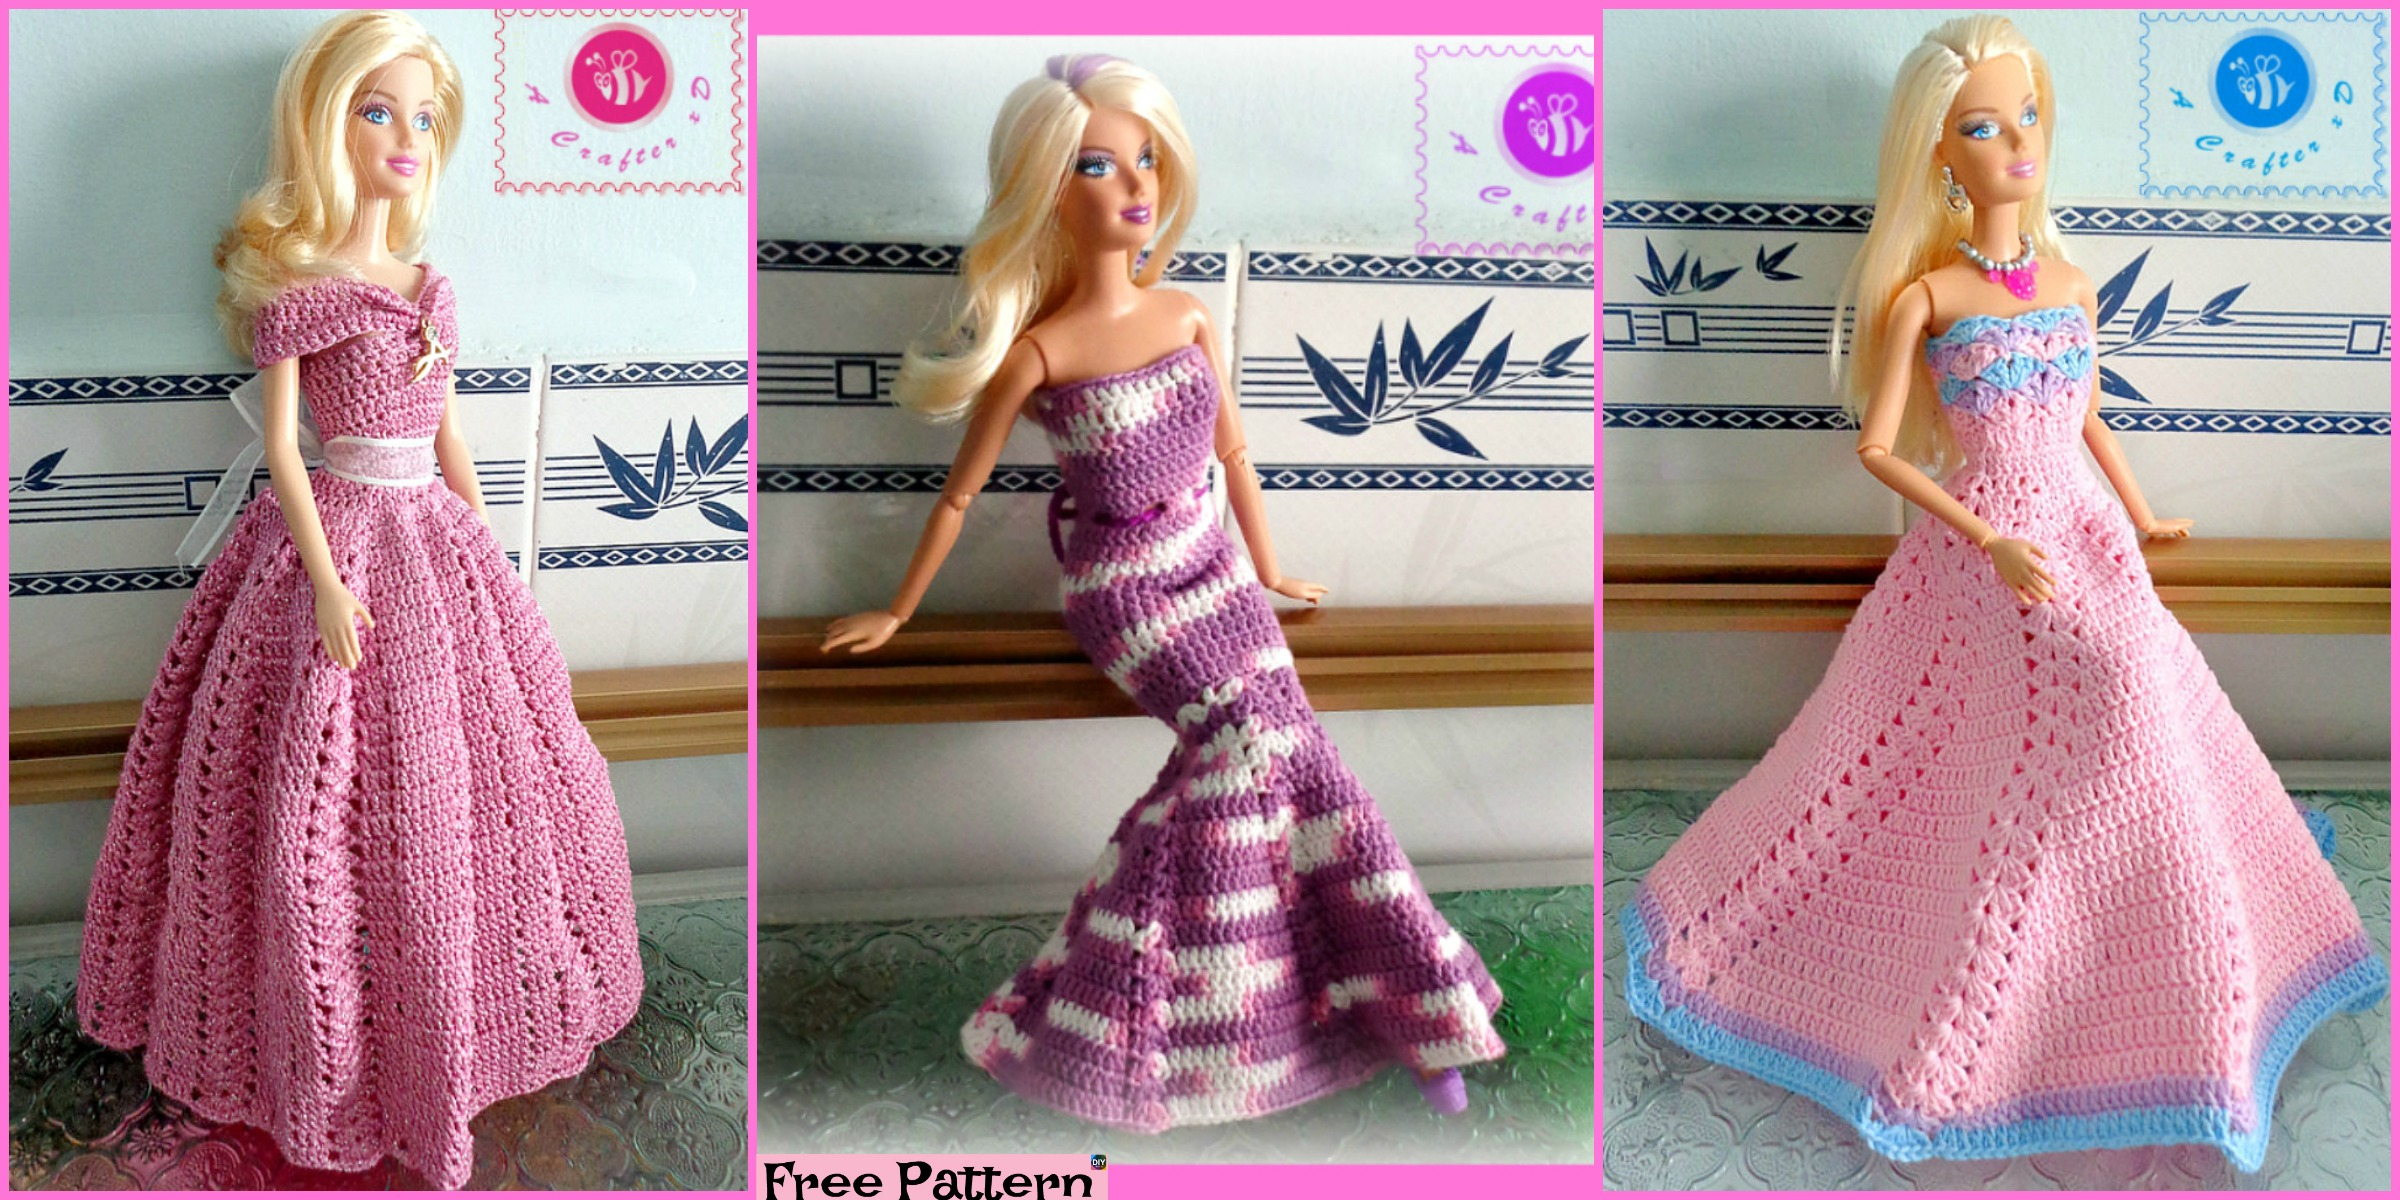 6 Pretty Crochet Doll Dress – Free Patterns